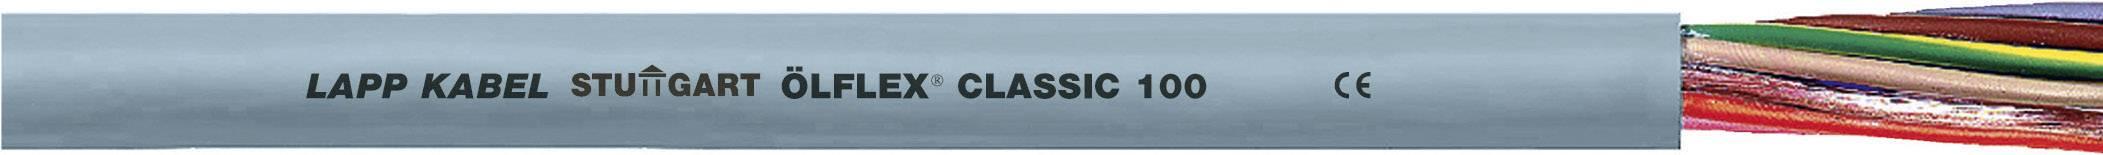 Kabel LappKabel Ölflex CLASSIC 100 5G16 (00101133), PVC, 22,8 mm, 750 V, šedá, 300 m